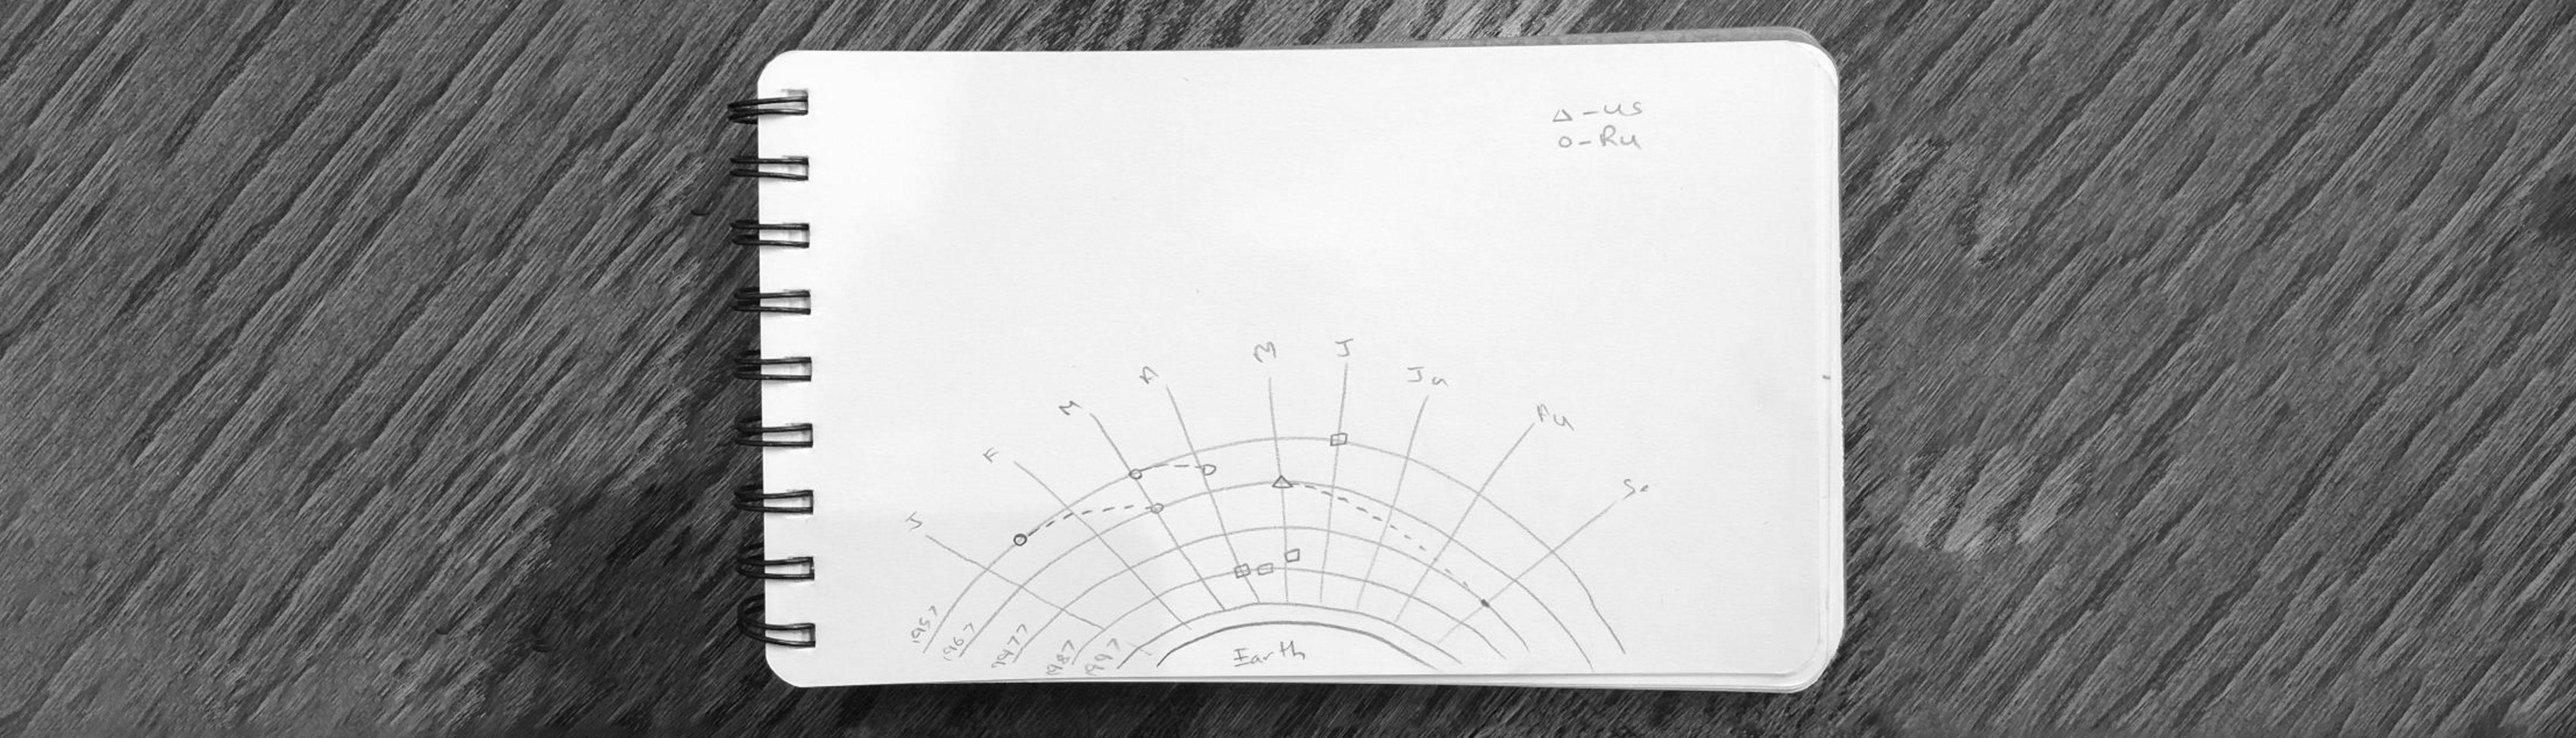 Rough sketch of data visualization on a sketchbook